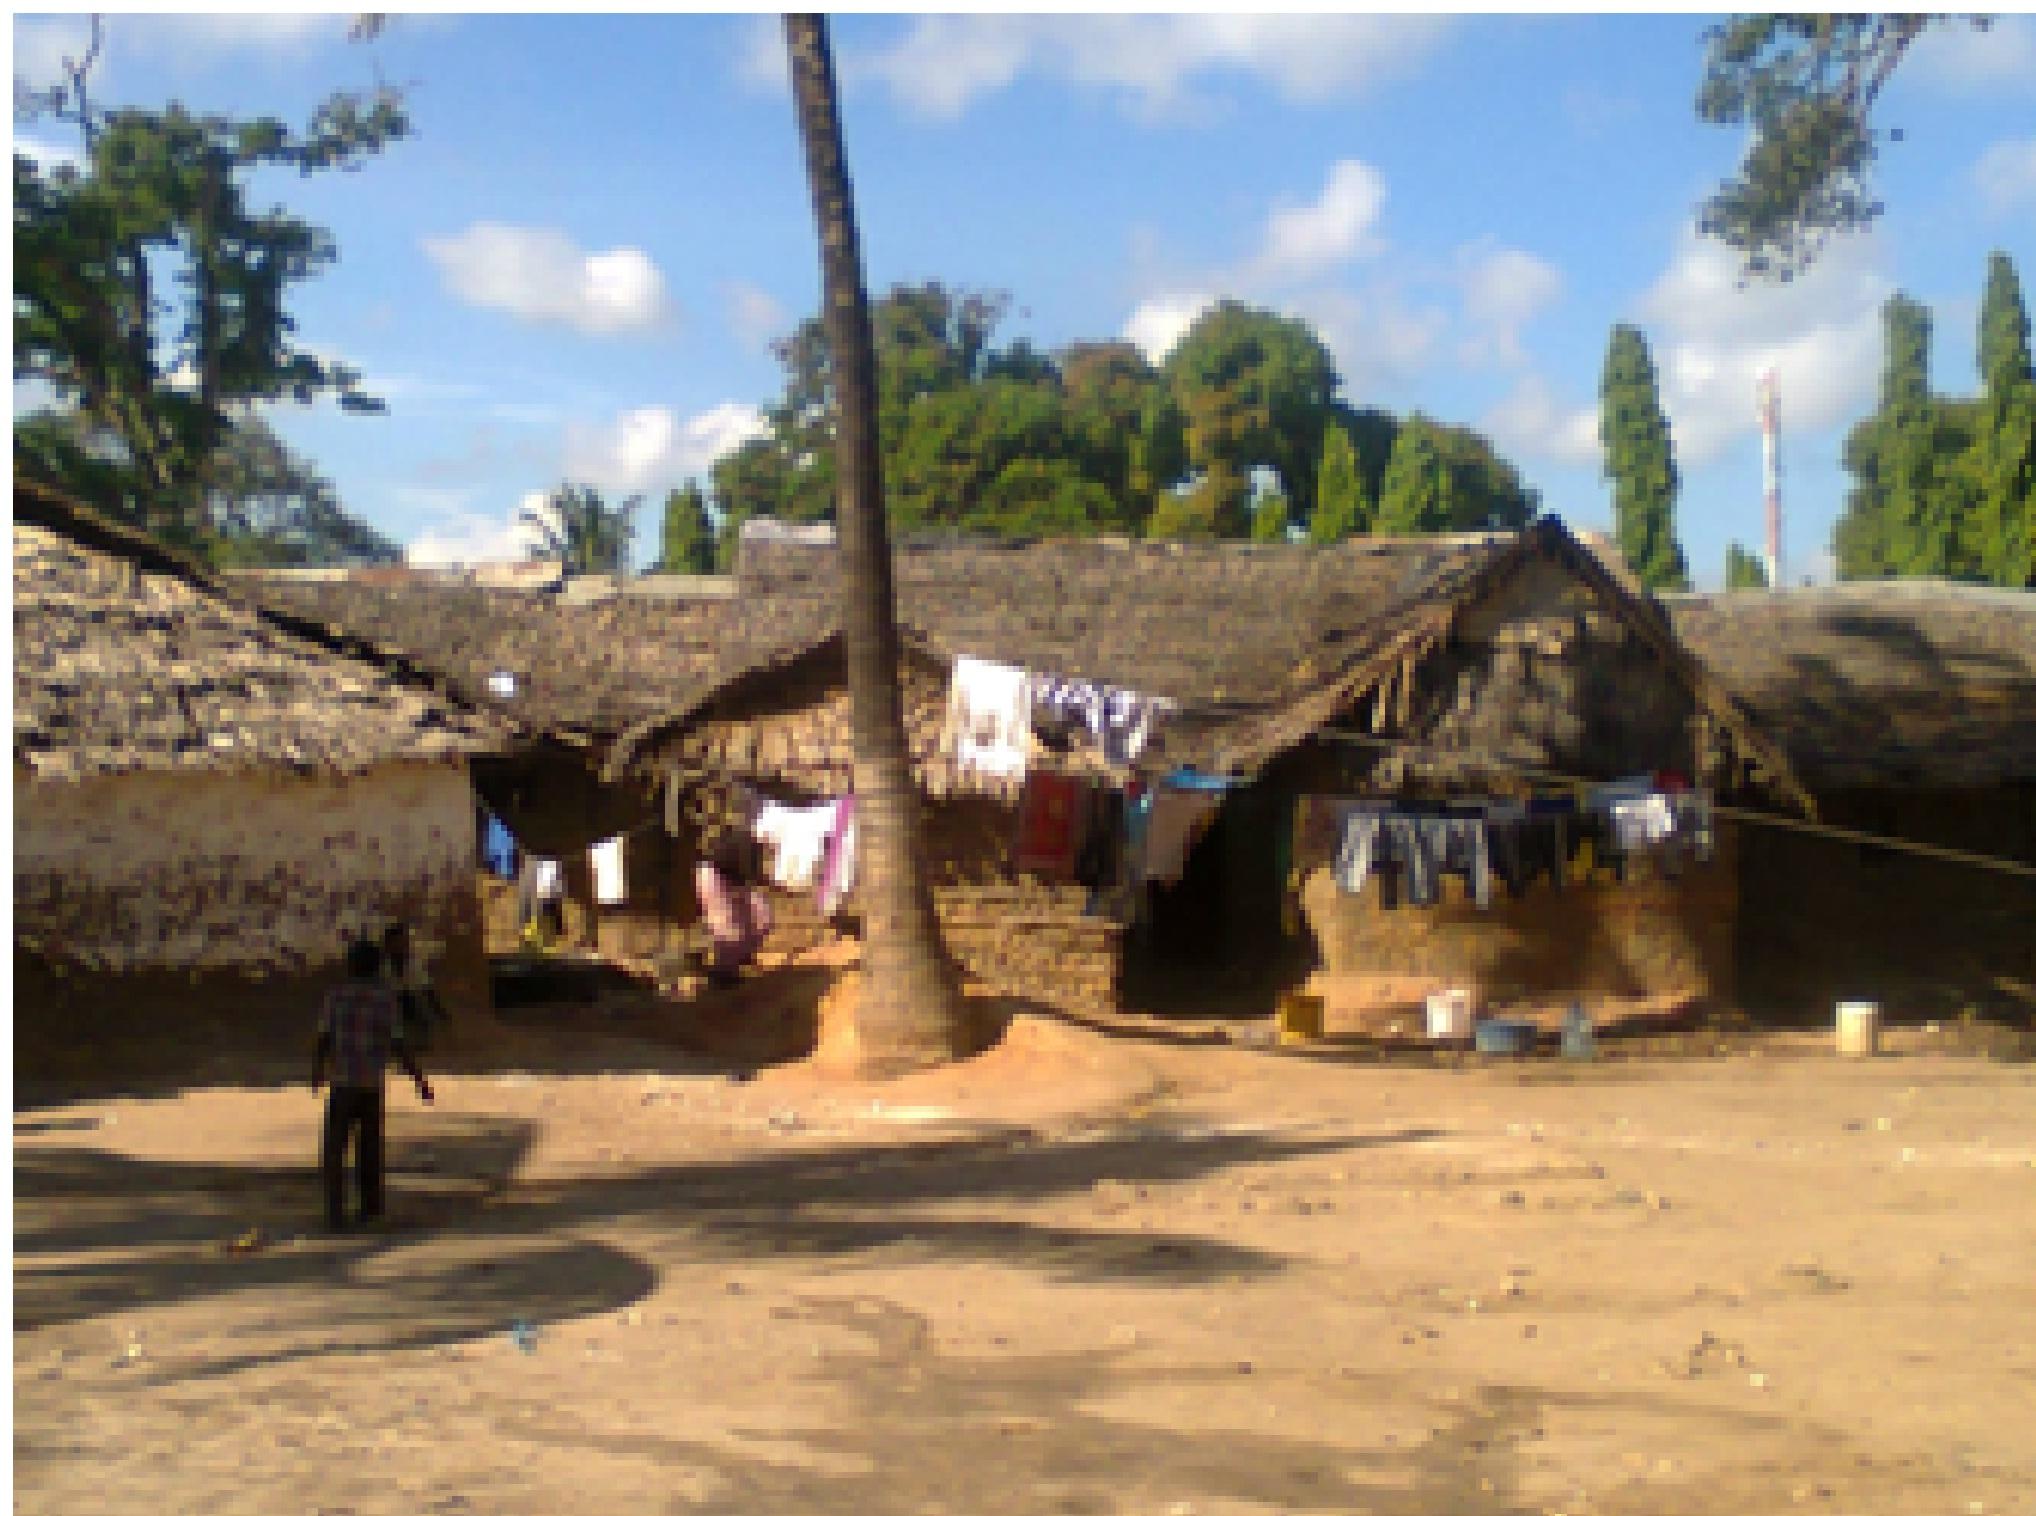 Matopeni Settlement